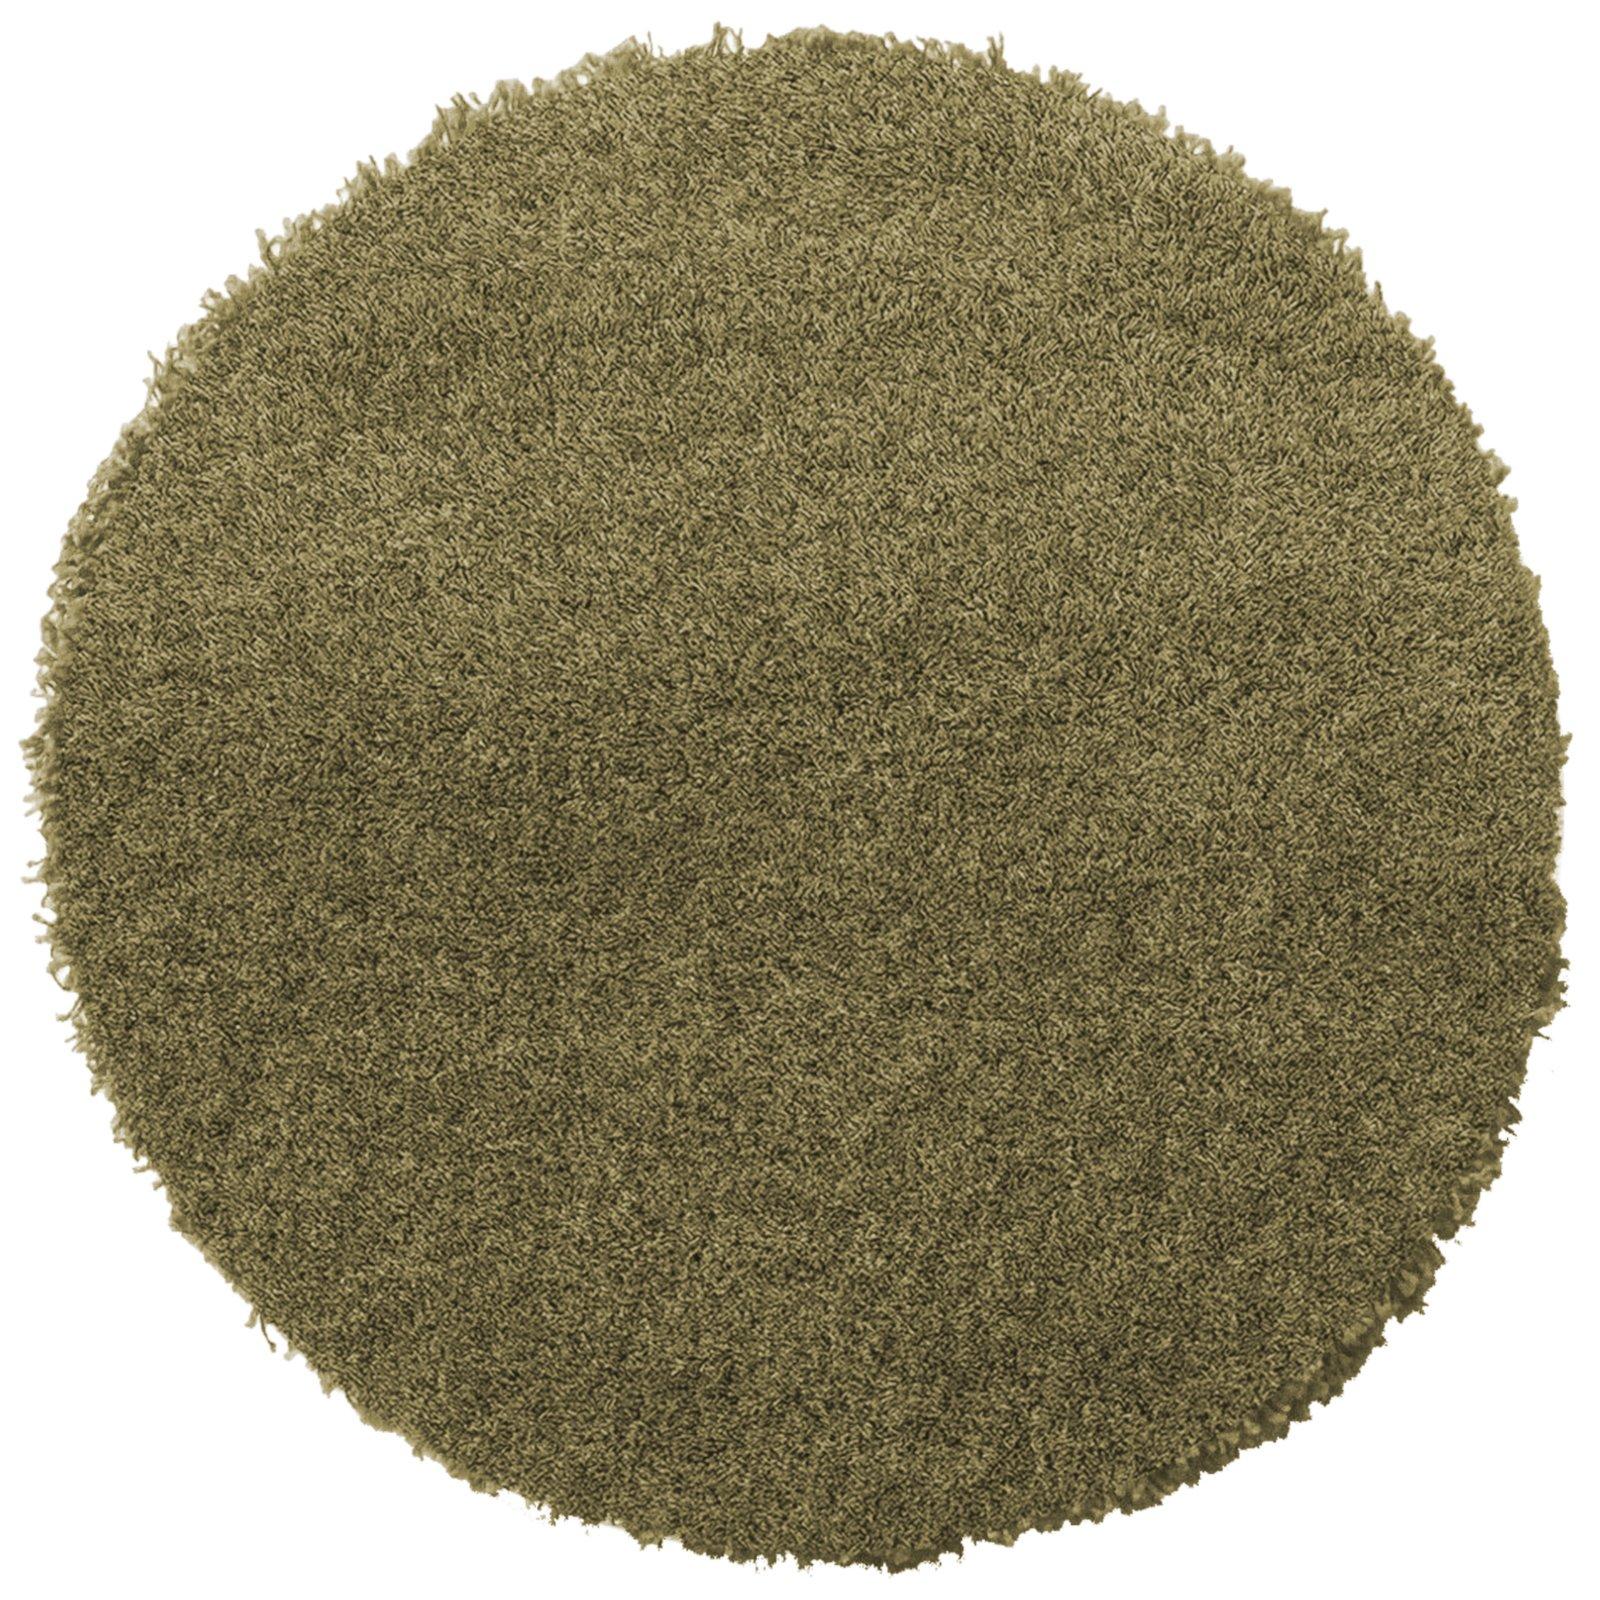 hochflor teppich shaggy plus gr n rund 200 cm hochflor shaggyteppiche teppiche. Black Bedroom Furniture Sets. Home Design Ideas